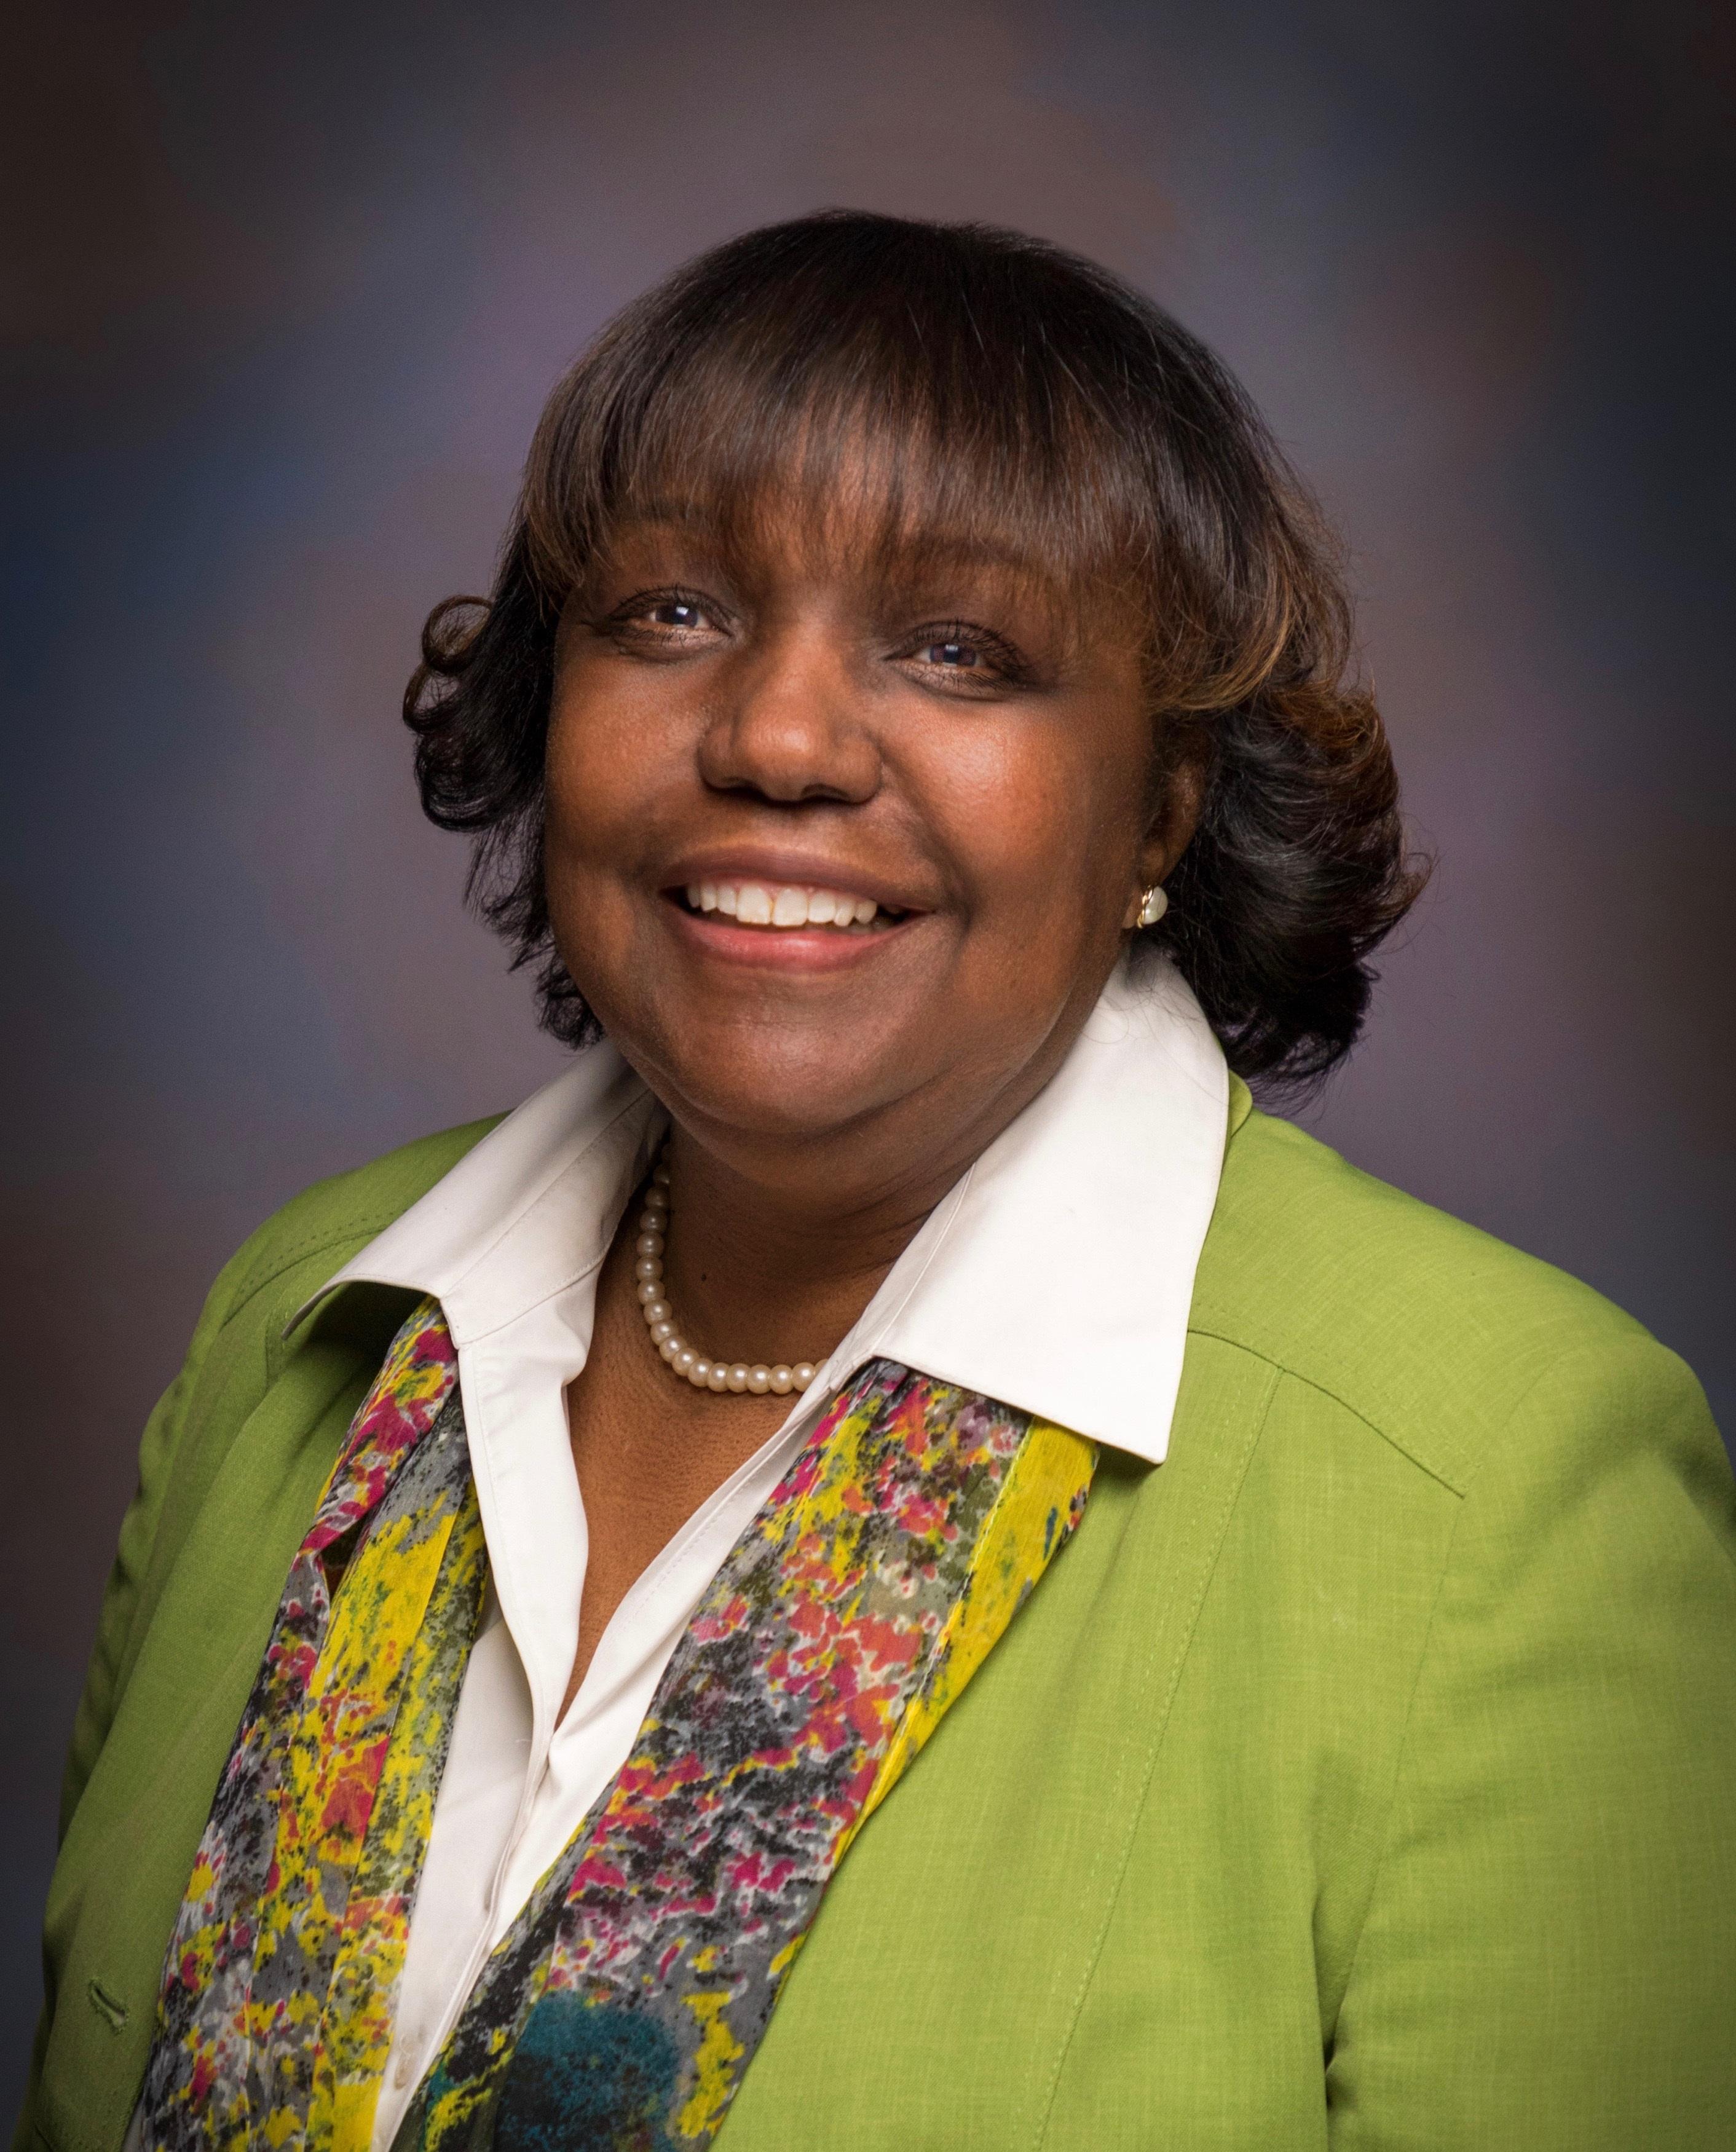 Dr. Judy White